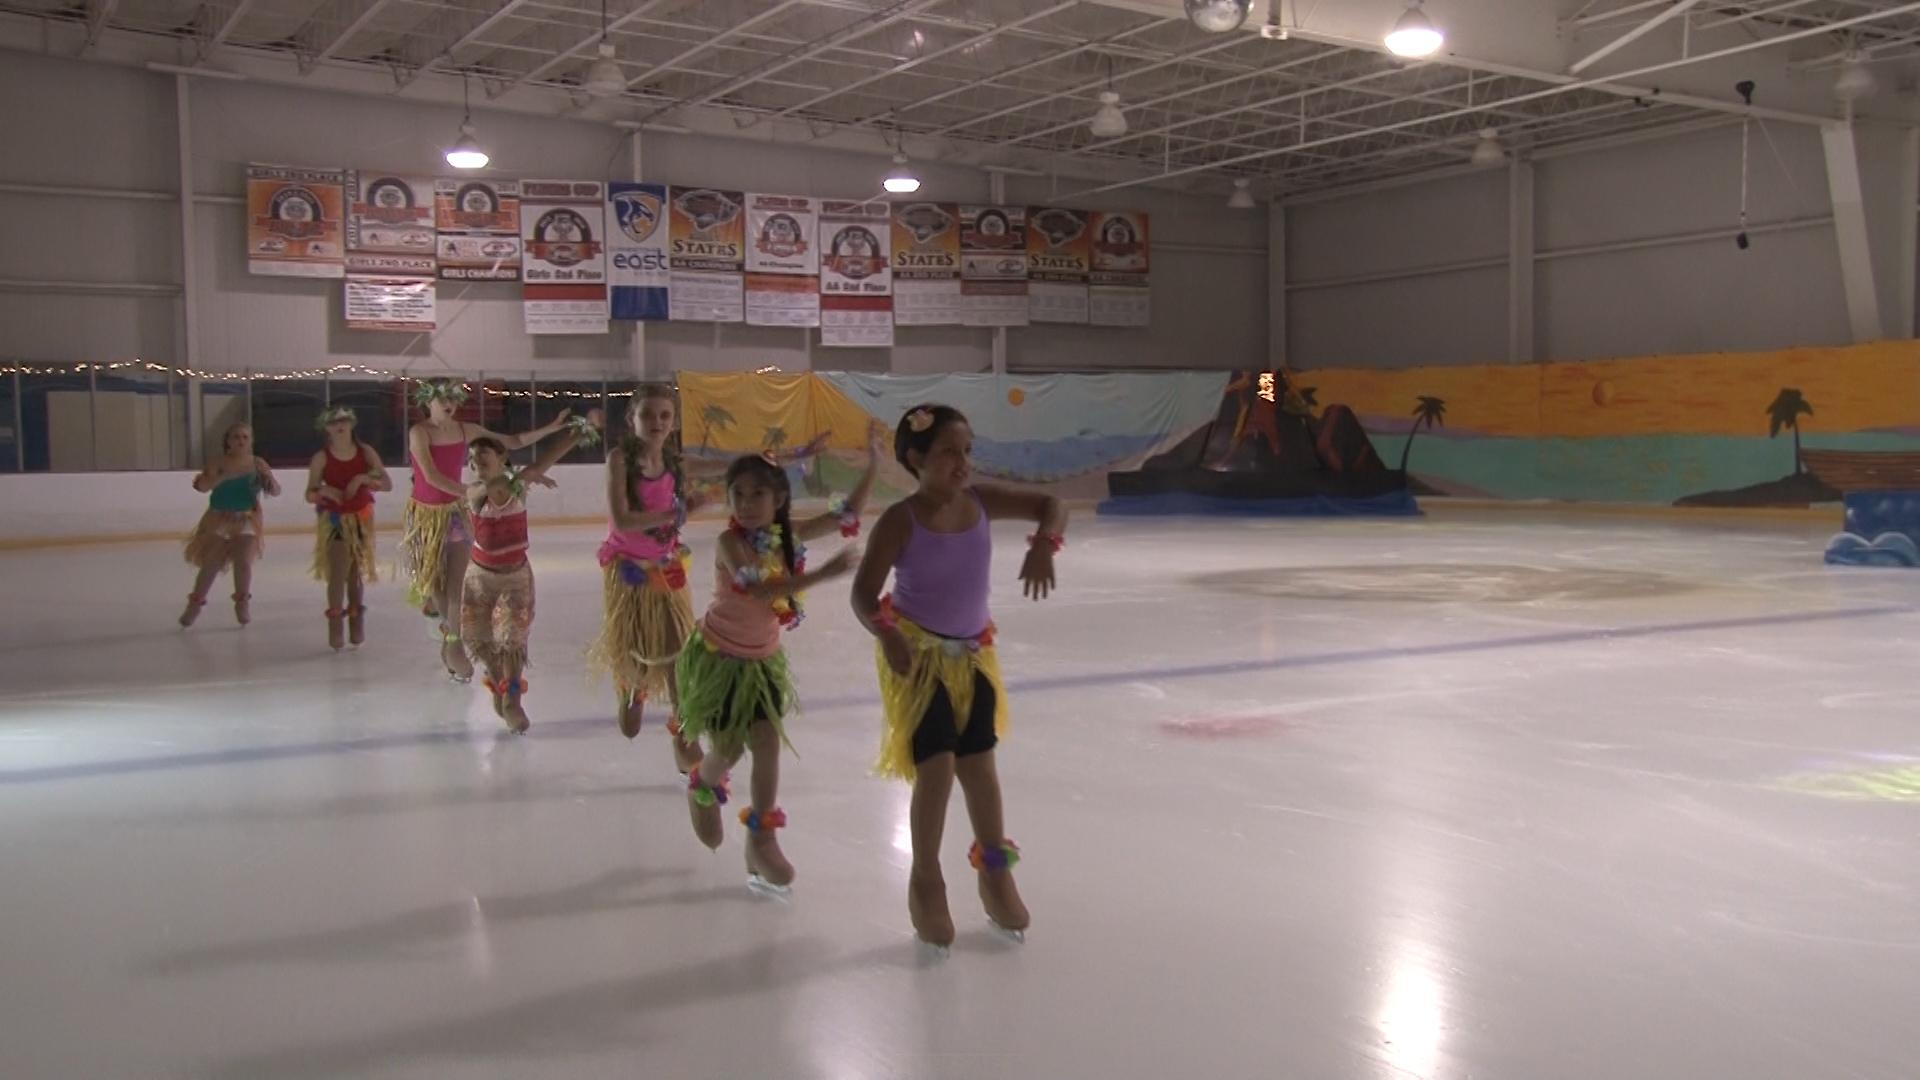 Power Play Maui Skate on Ice 071417.00_11_25_00.Still019.jpg